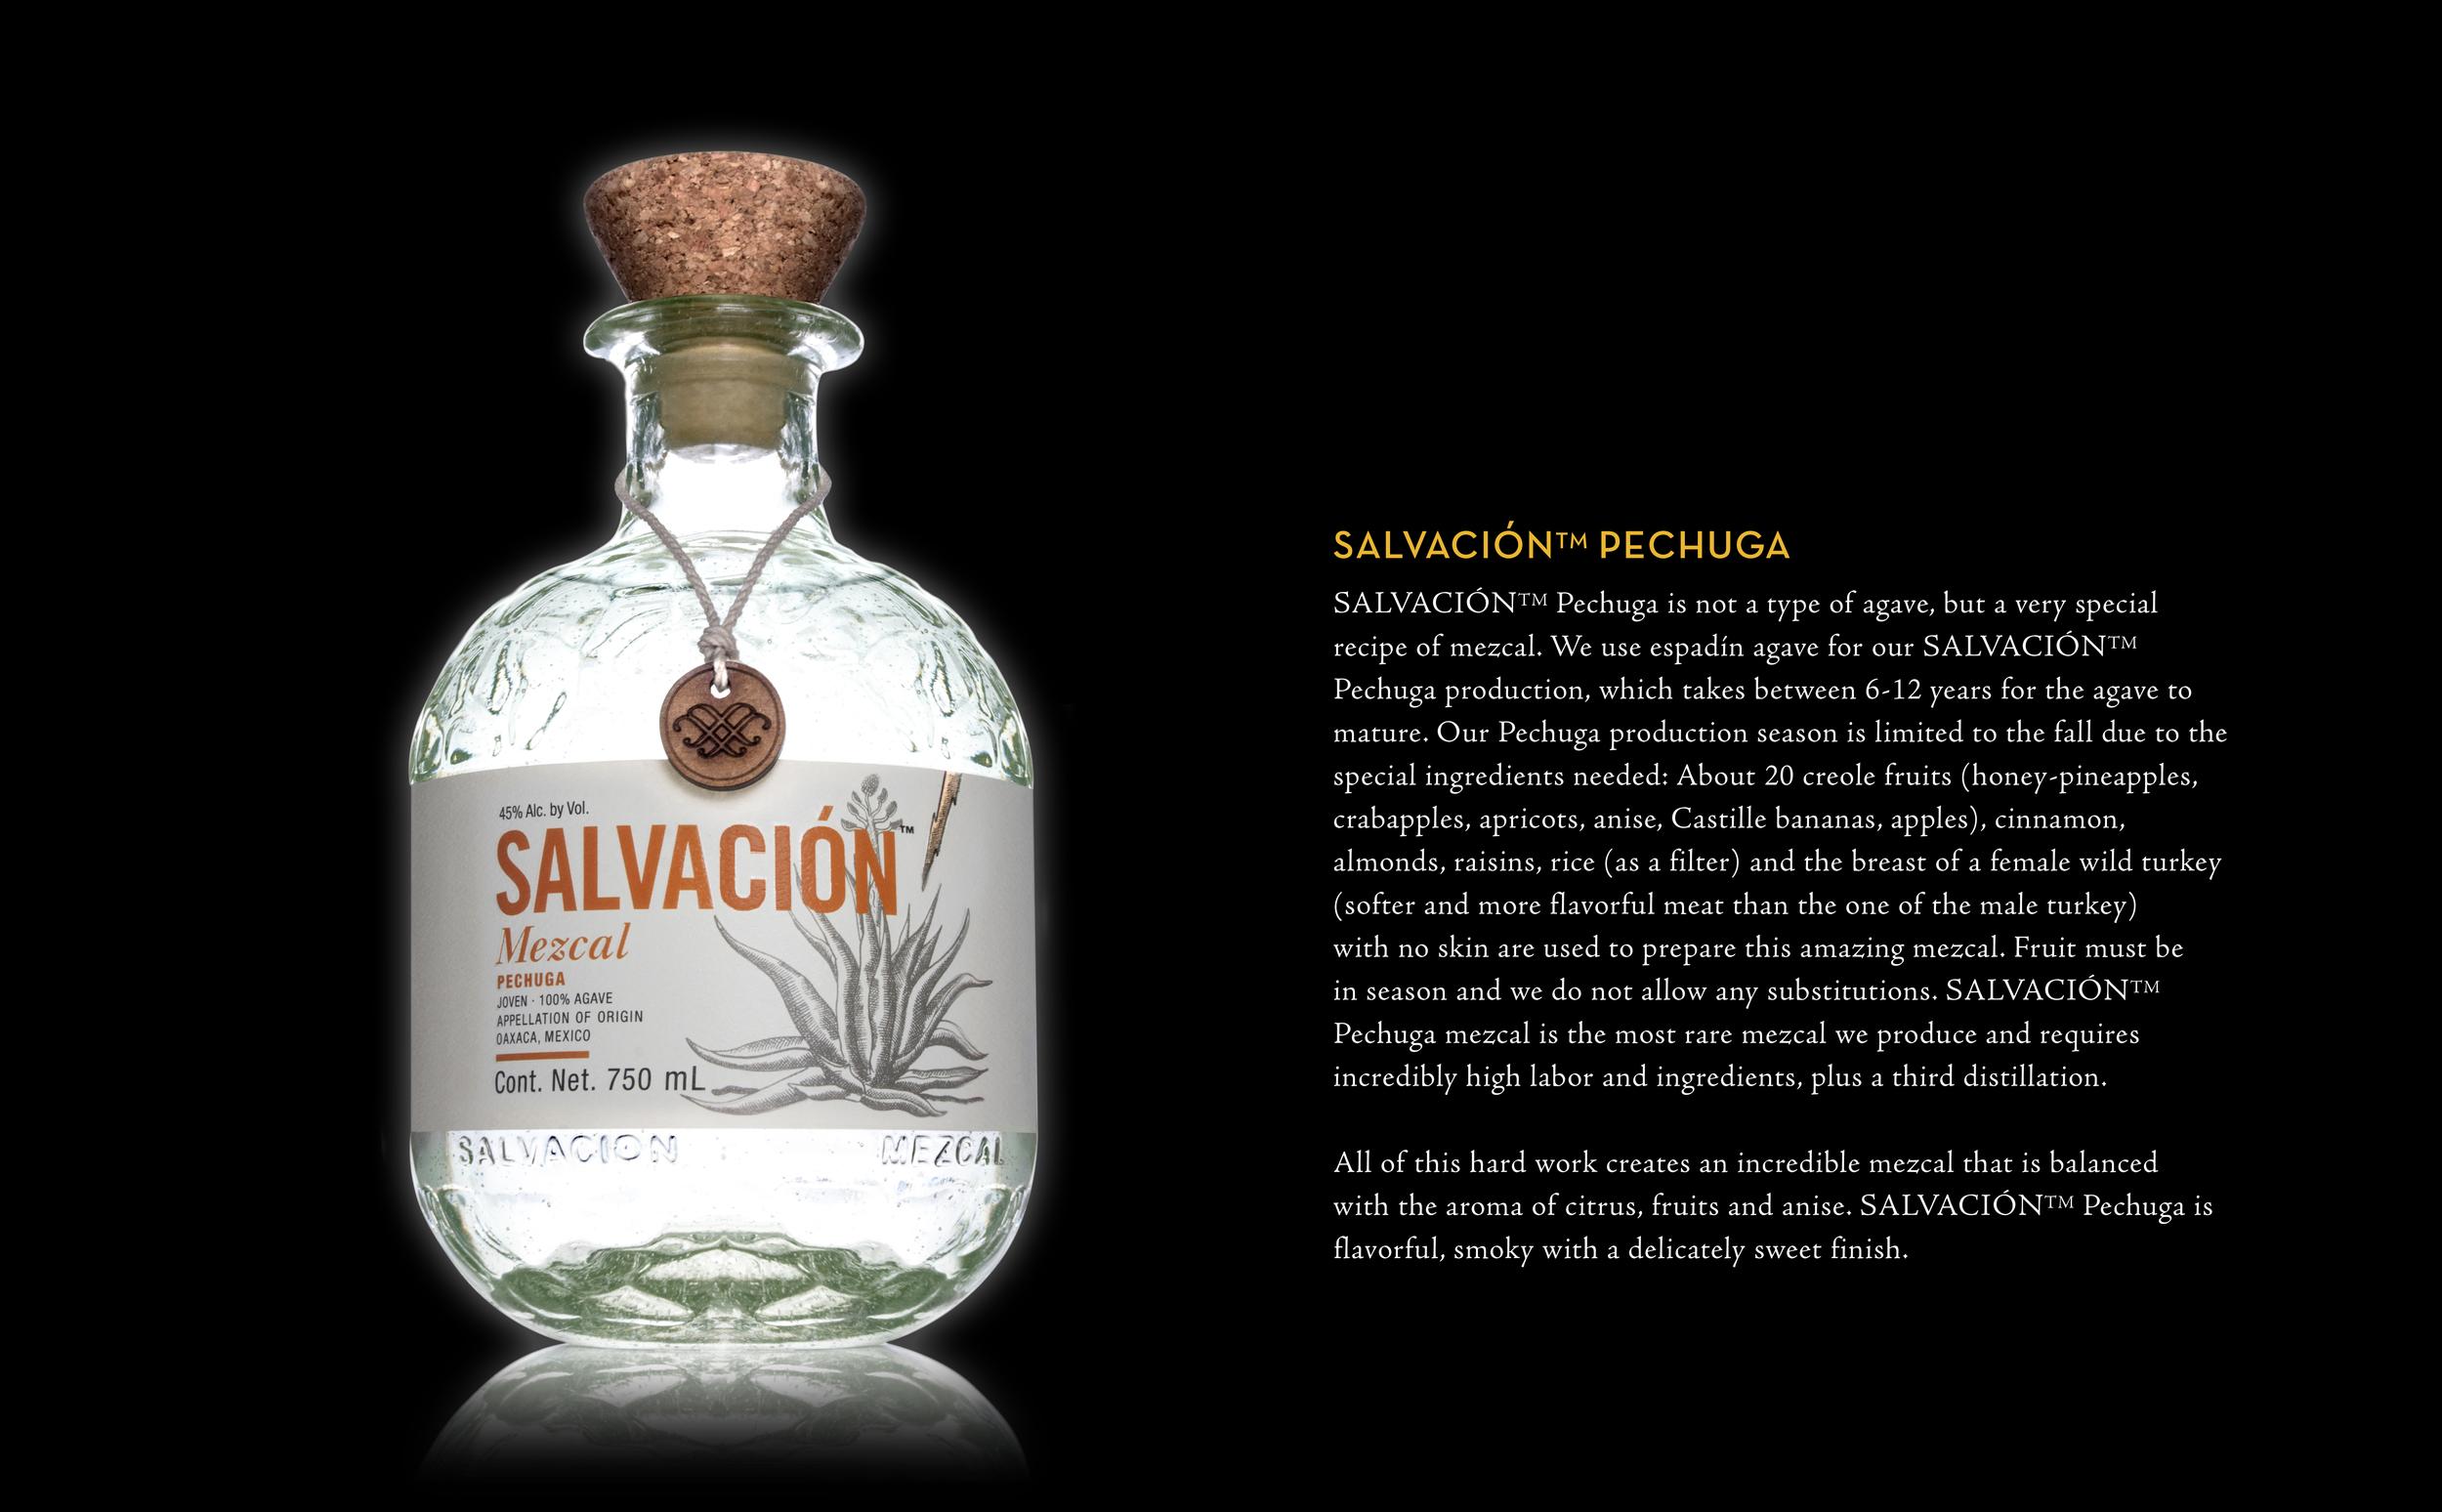 SALVACION-Pechuga-description.jpg